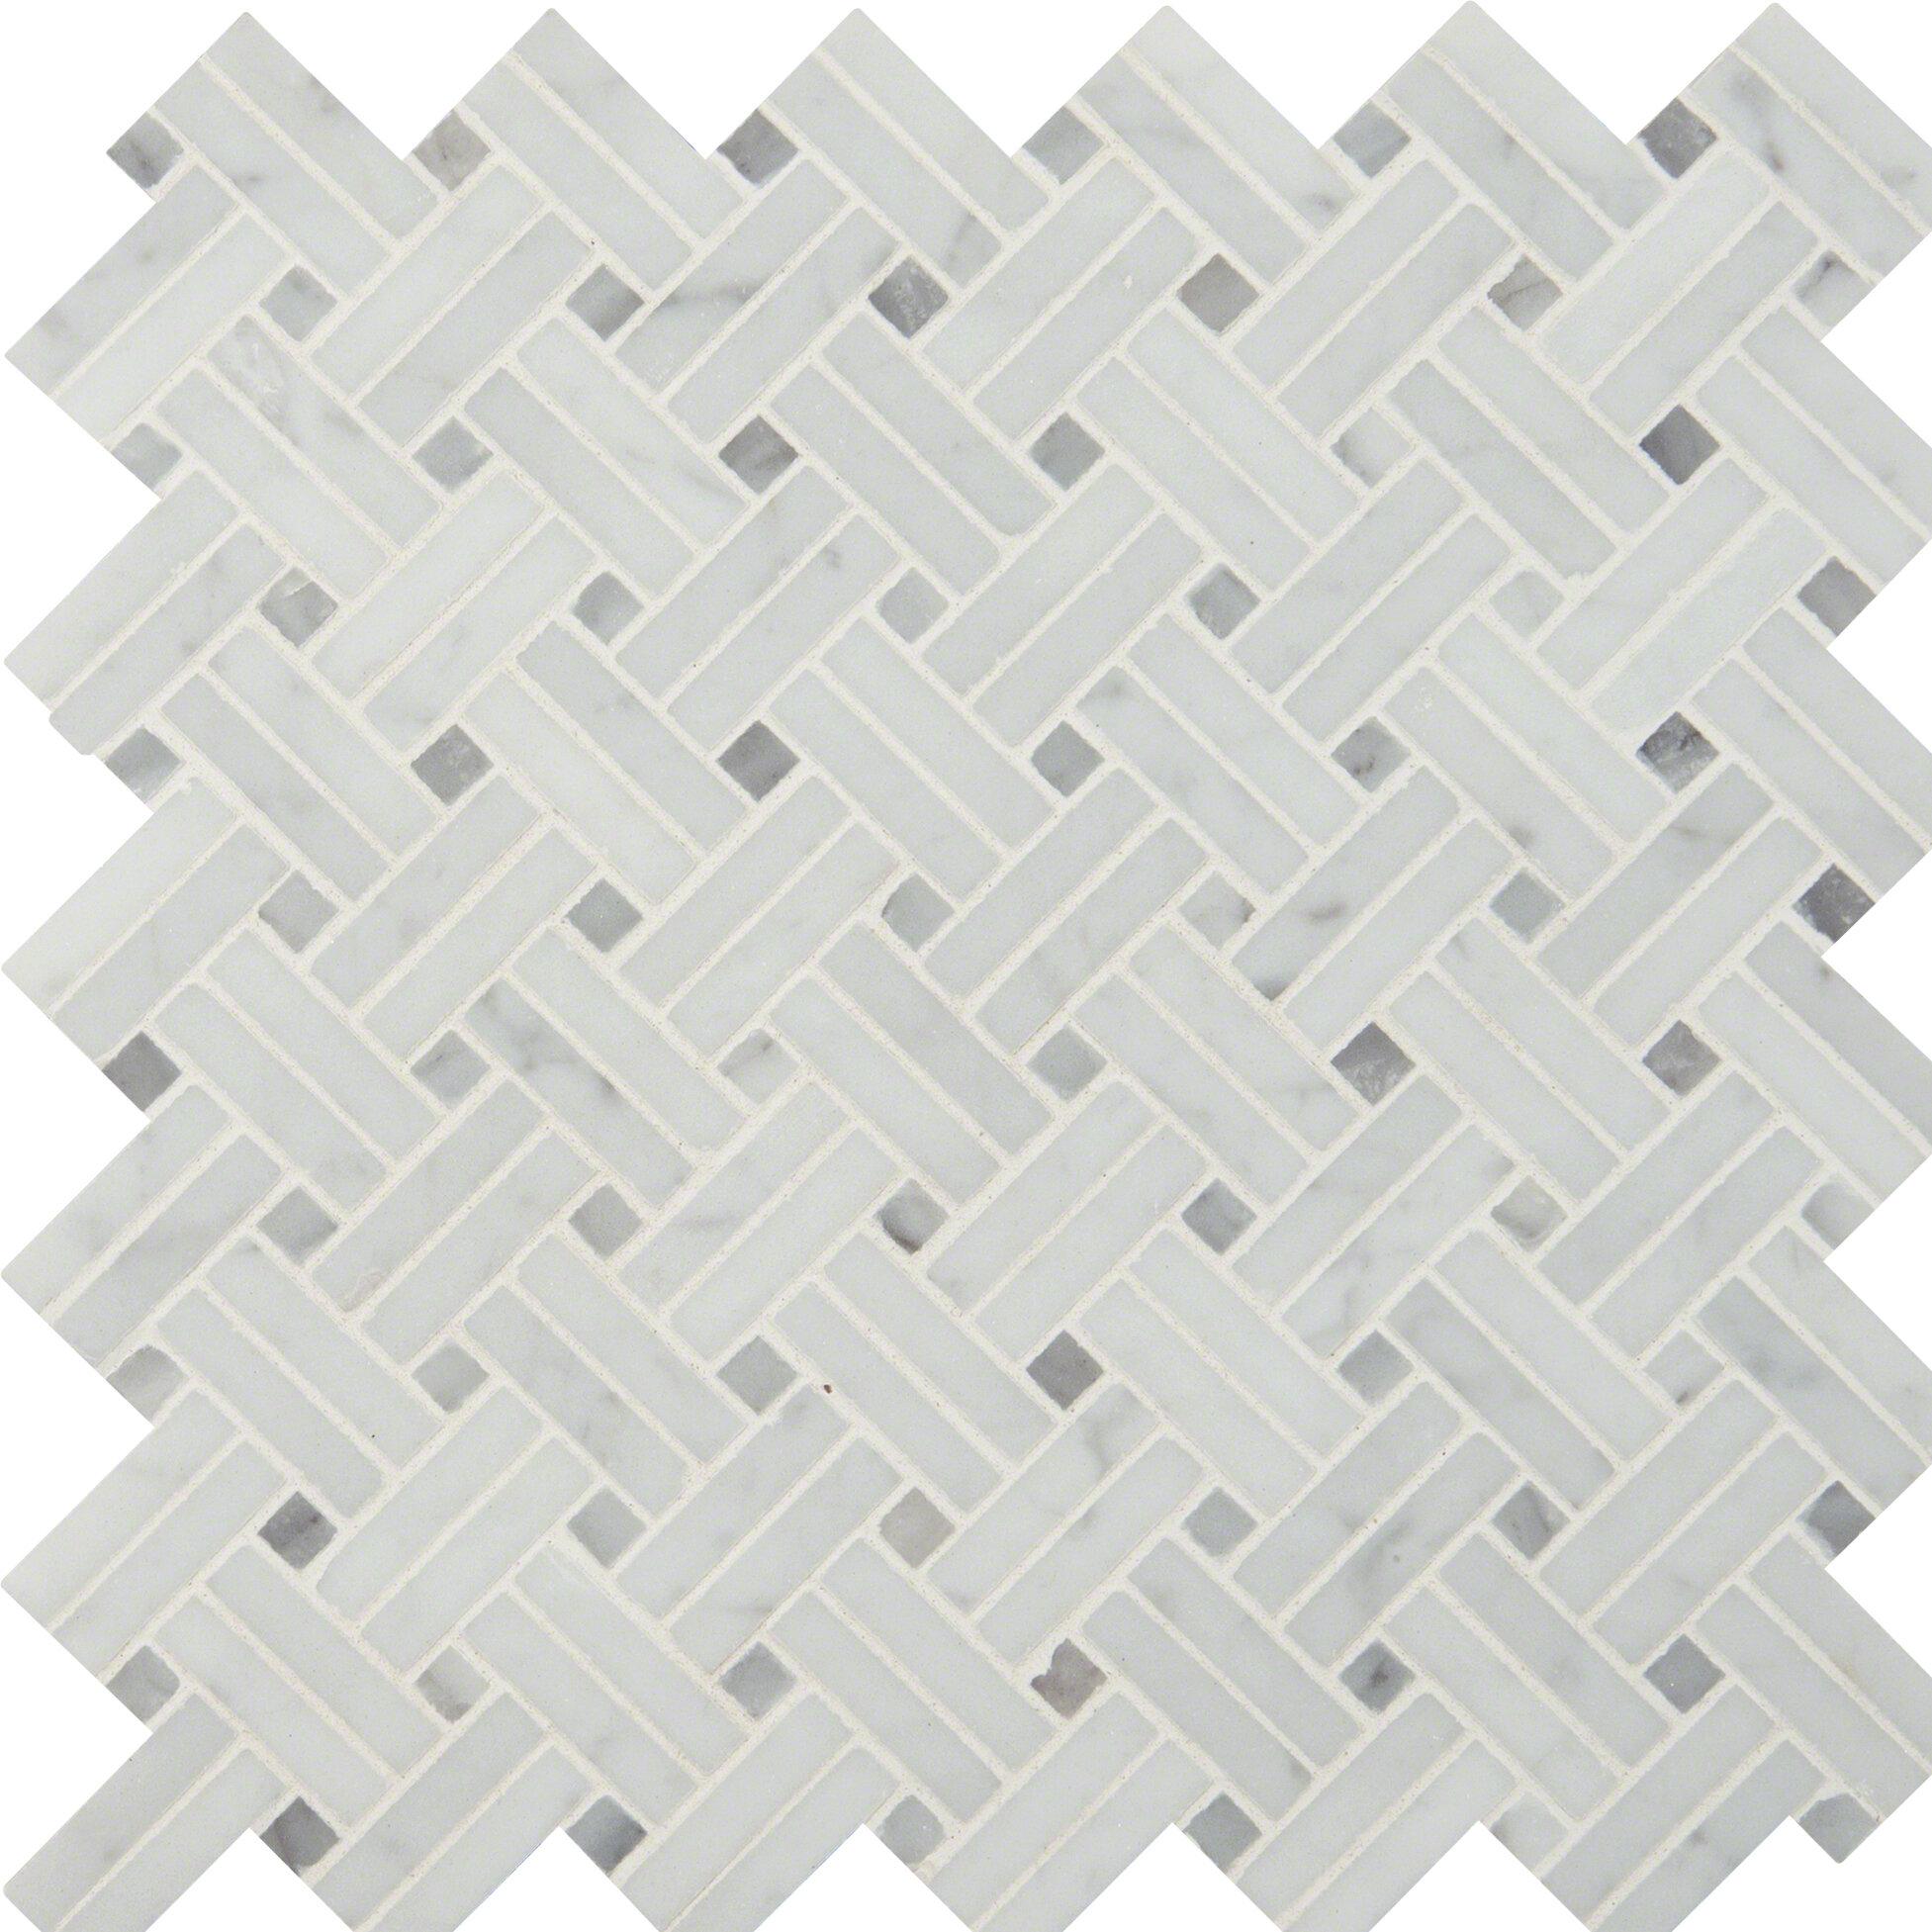 Carrara Marble Mosaic Tile   Wayfair